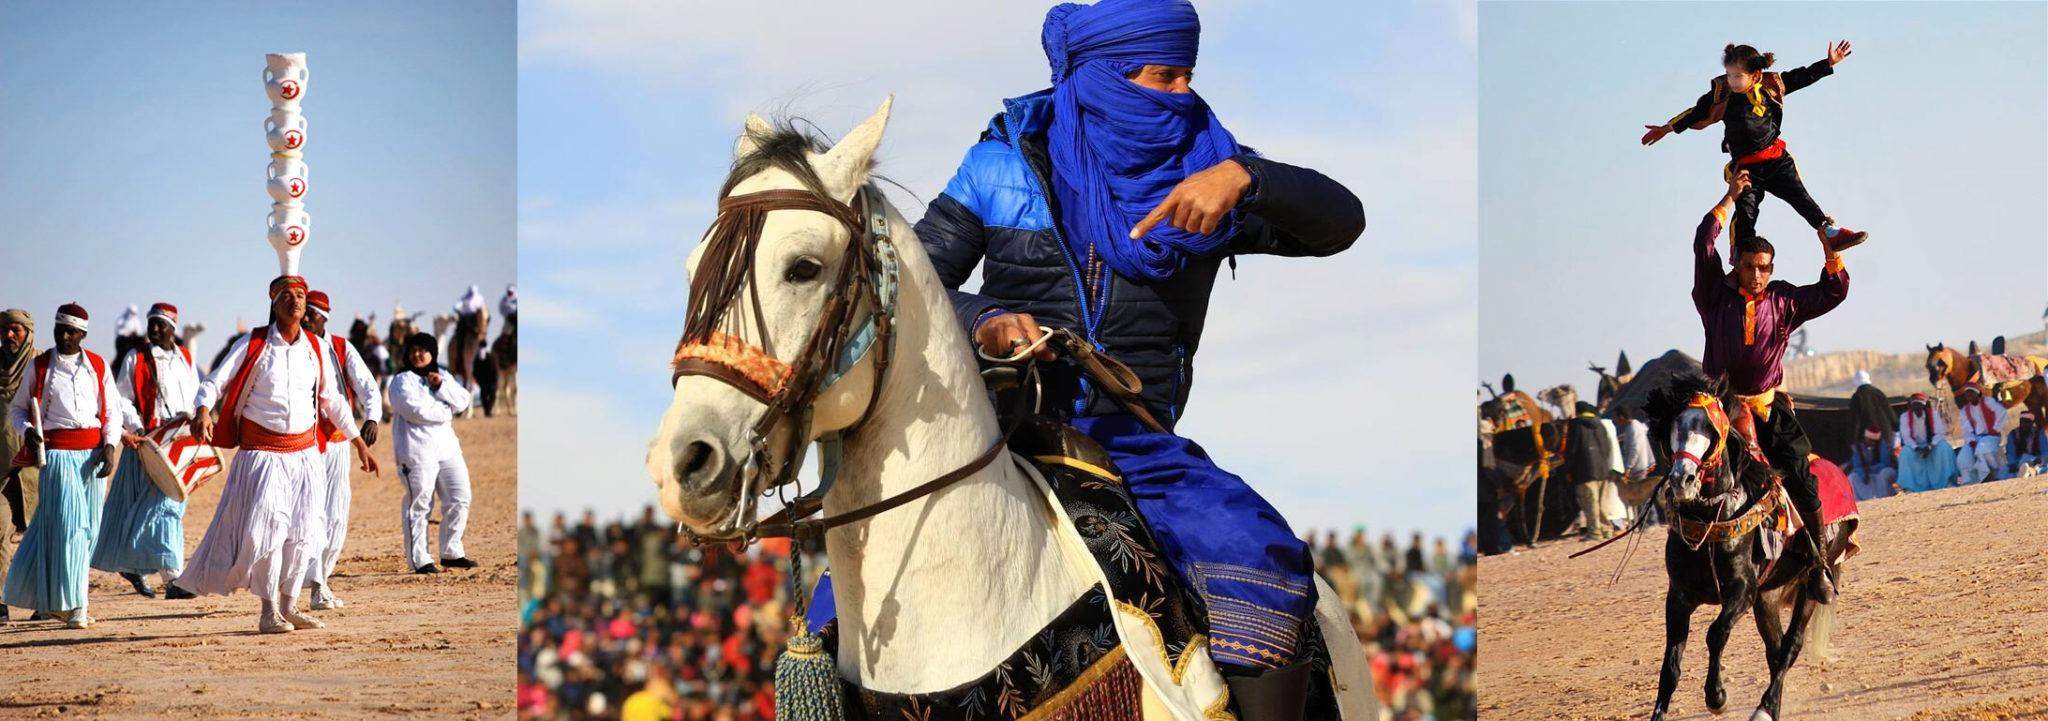 International Festival of the Sahara - Globetrotting horse riding holidays